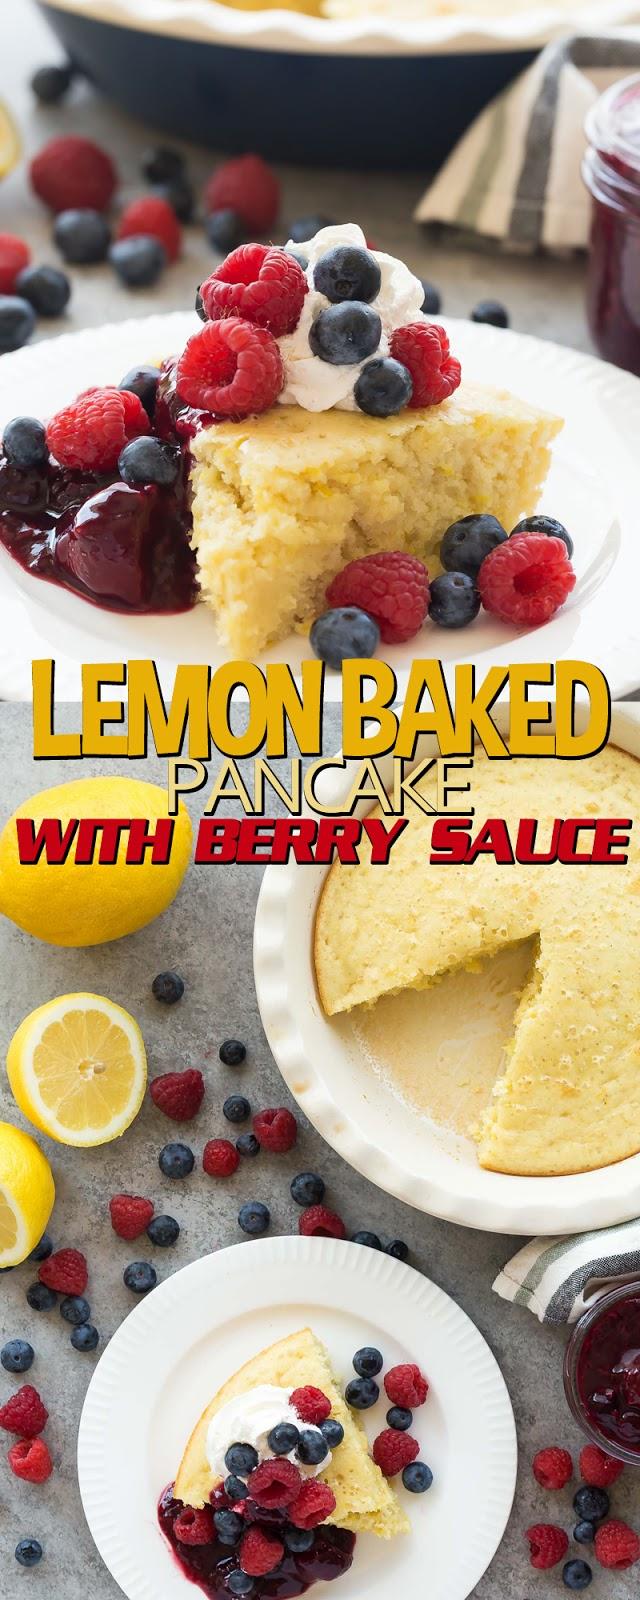 LEMON BAKED PANCAKE WITH BERRY SAUCE